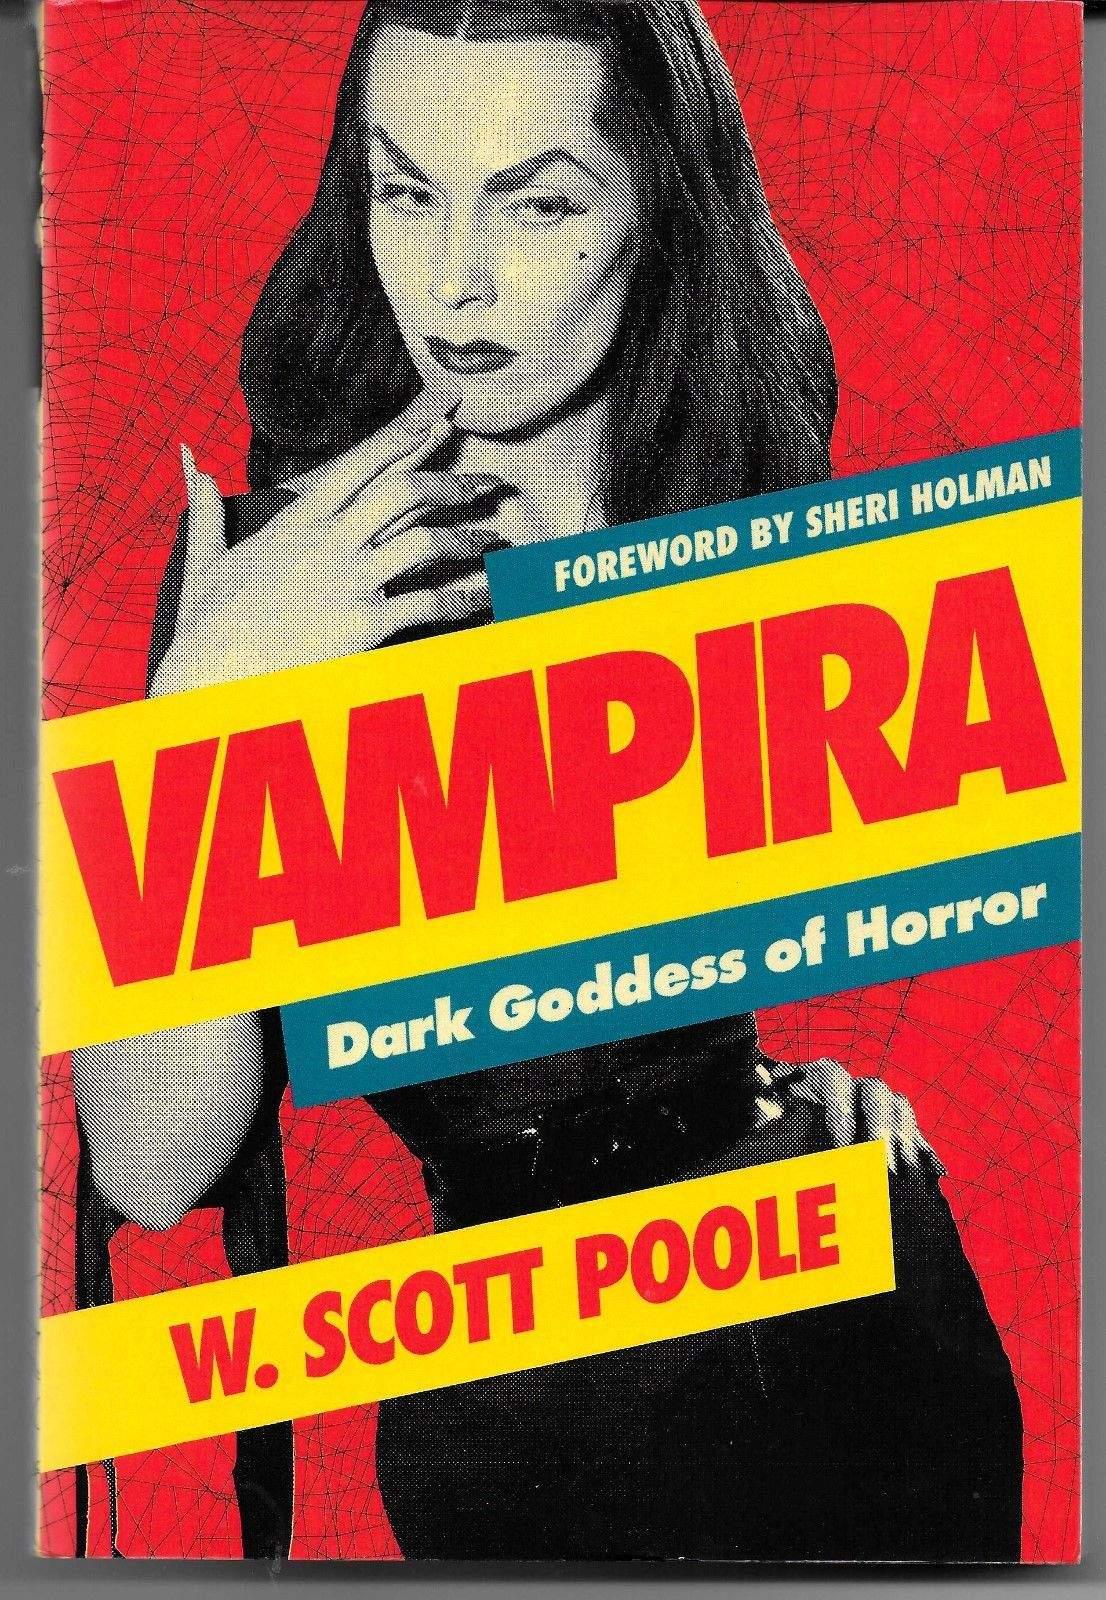 Vampira Dark Goddess of Horror Softcover Book NEW by W. Scott Poole Horror Host